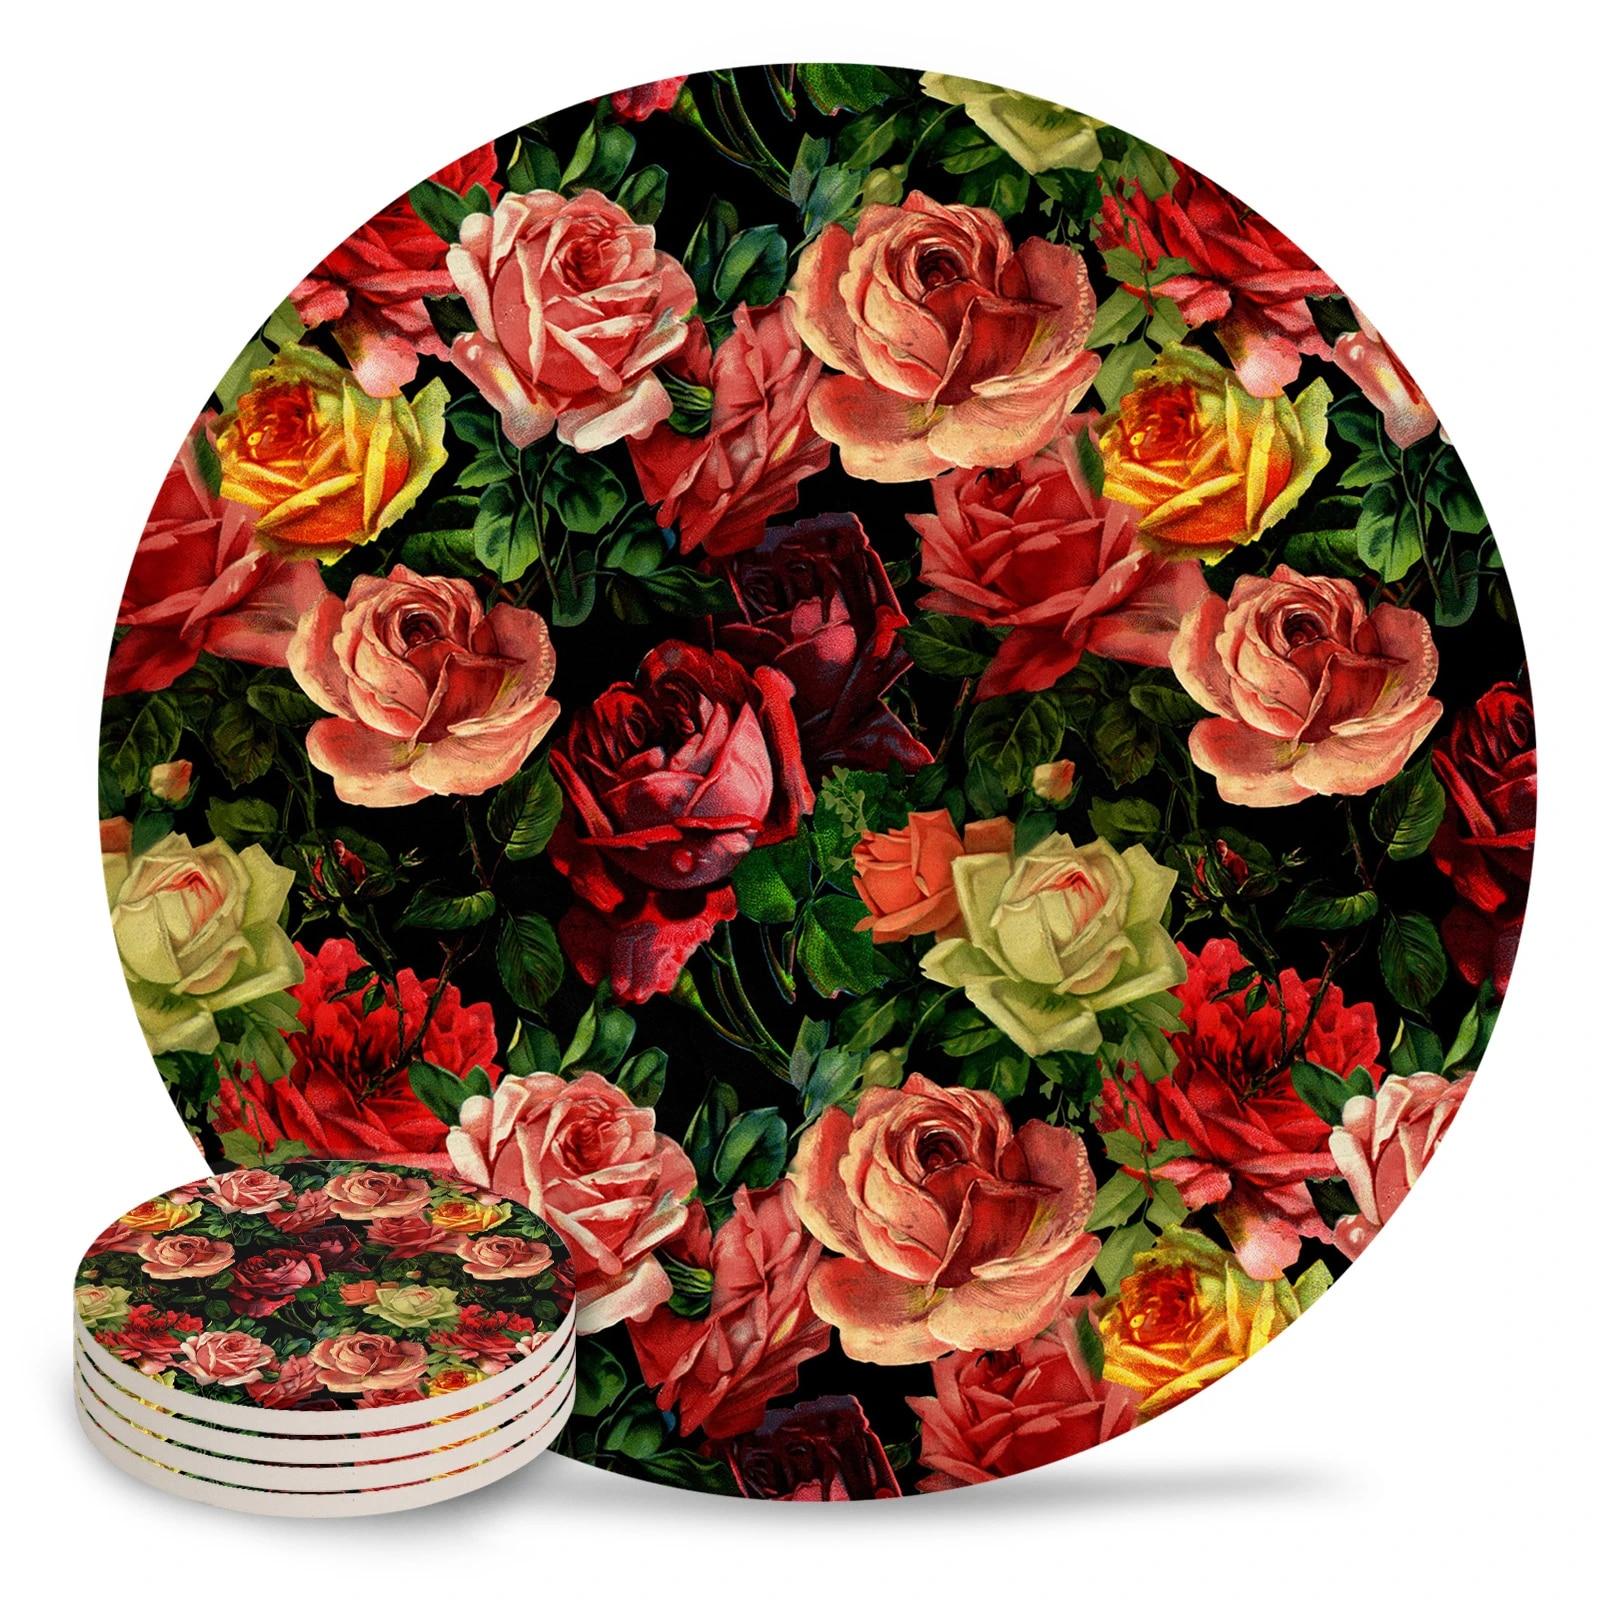 vintage florals Vintage Roses Floral coasters kitchen table decor Shabby Chic table decor set of 4 floral drink mats flowers print